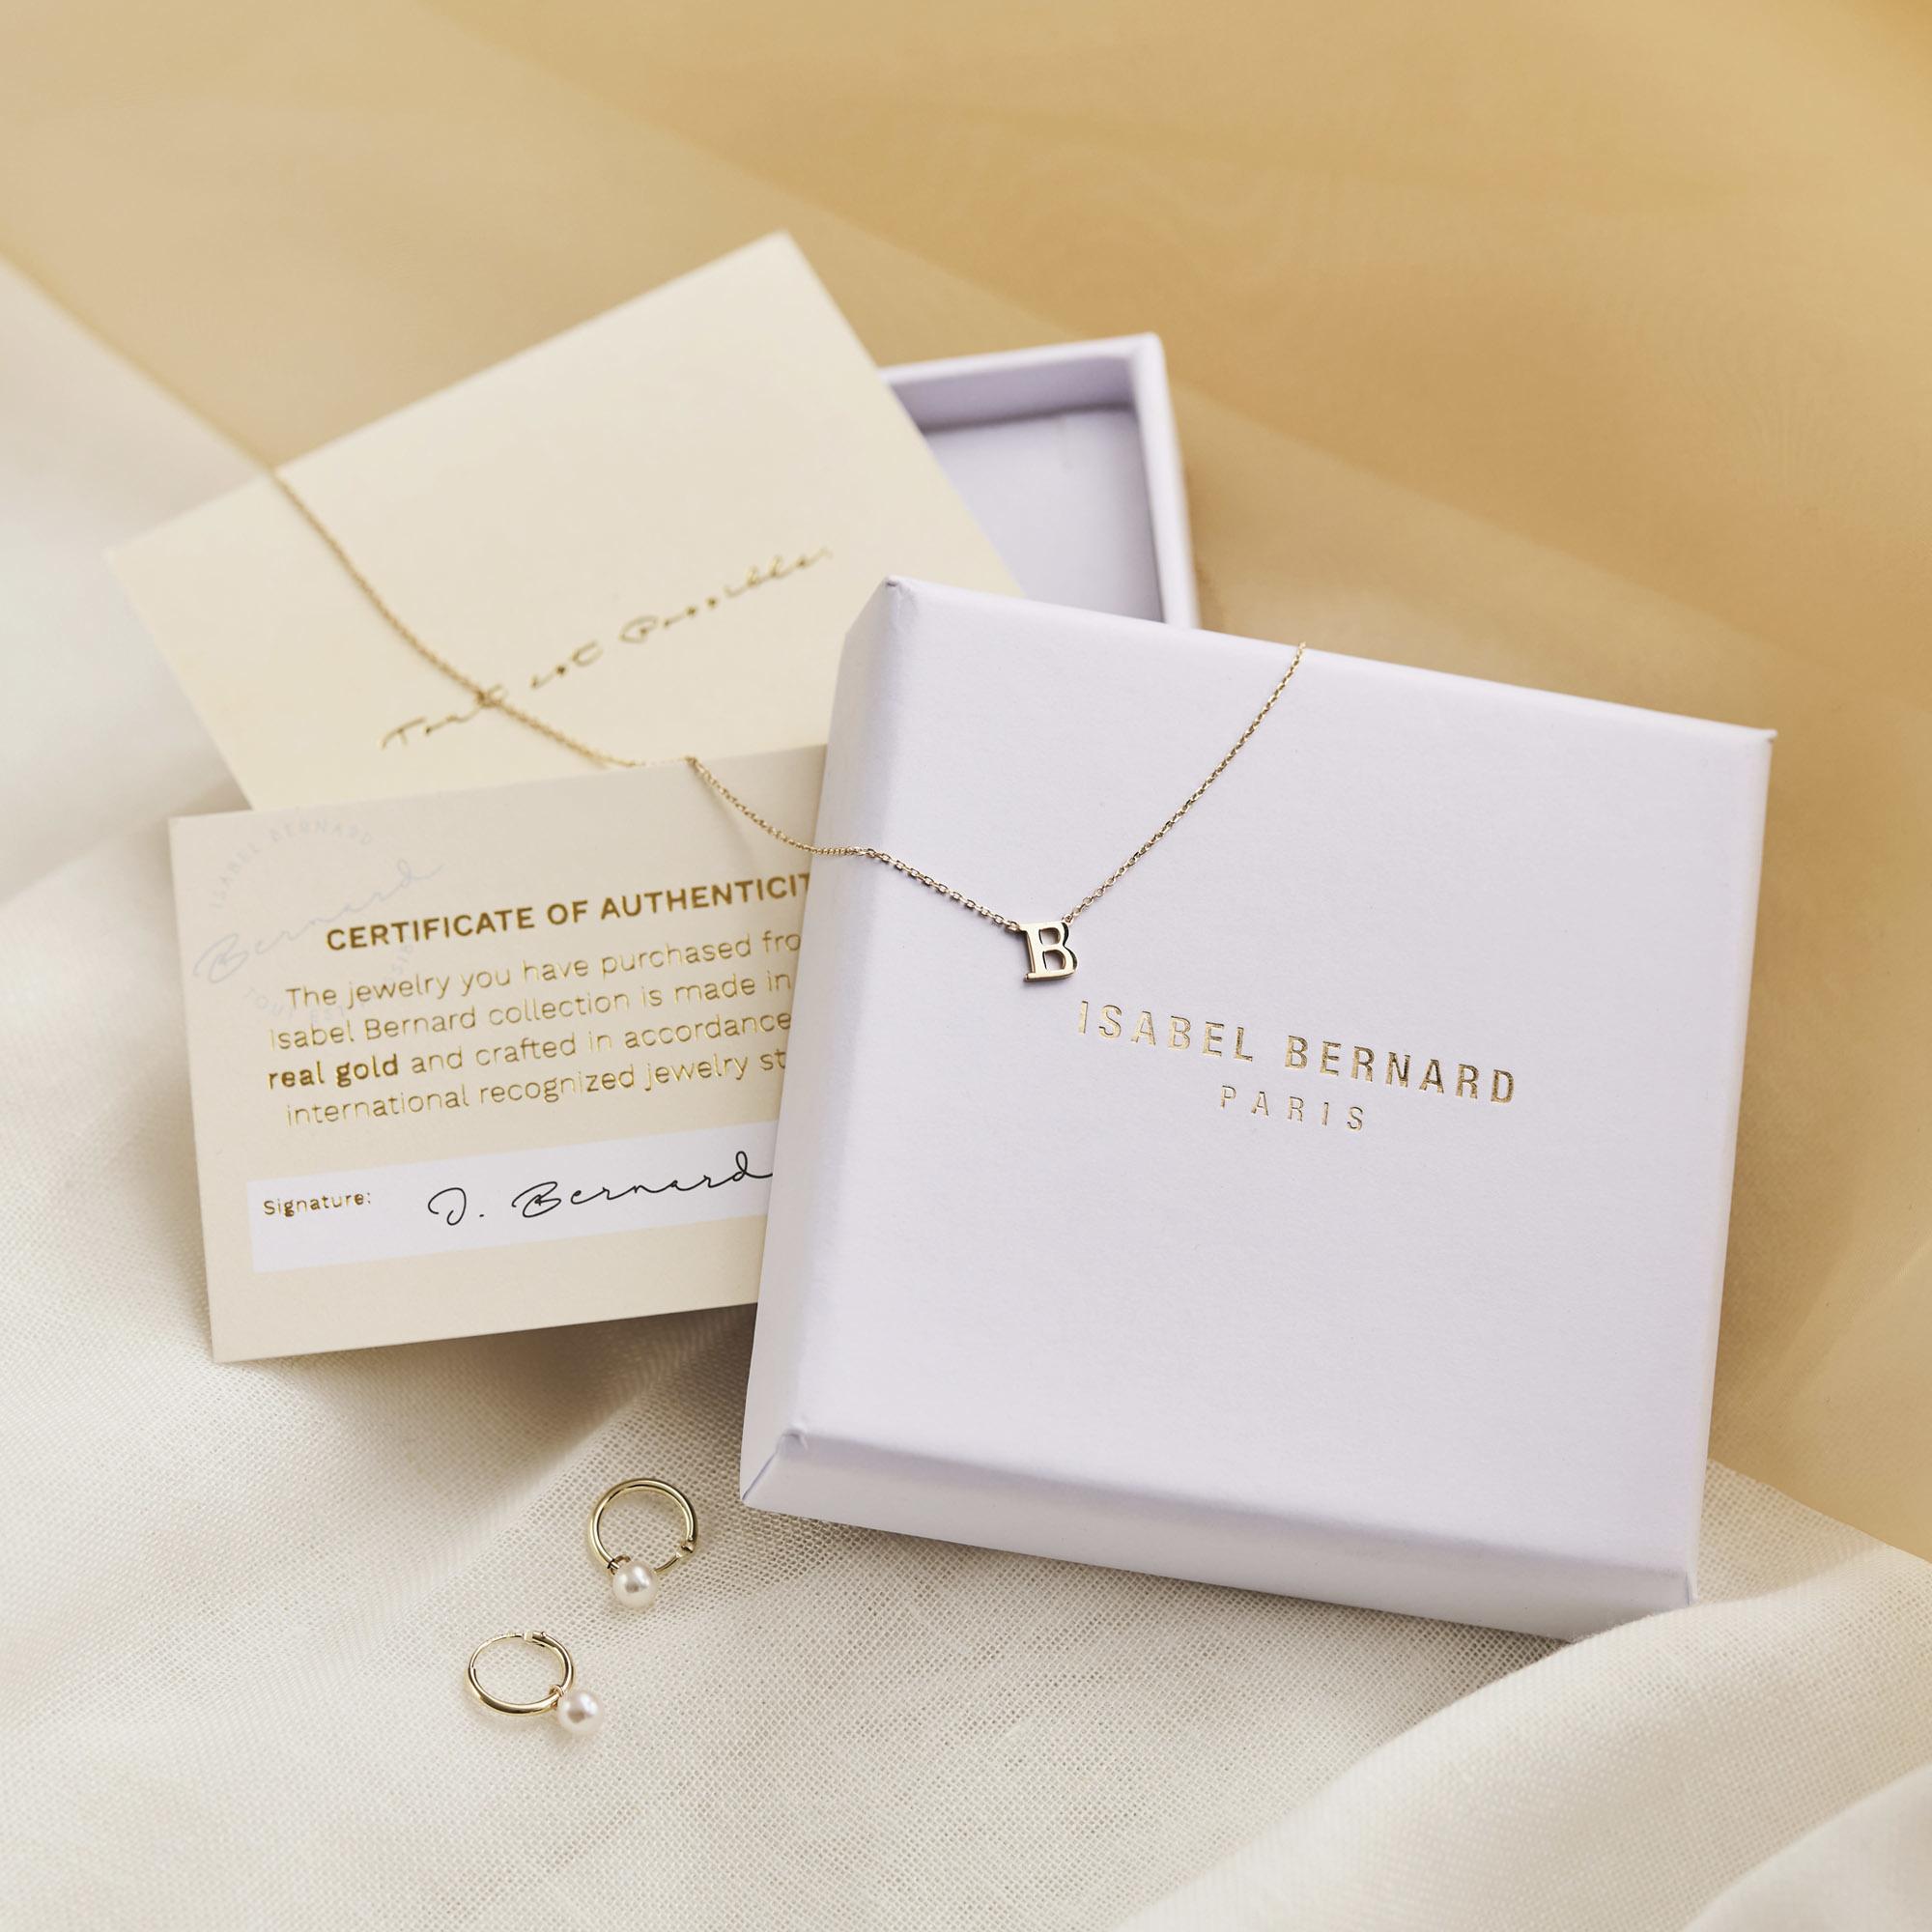 Isabel Bernard Saint Germain Felie ciondolo iniziale cubo in oro bianco 14 carati